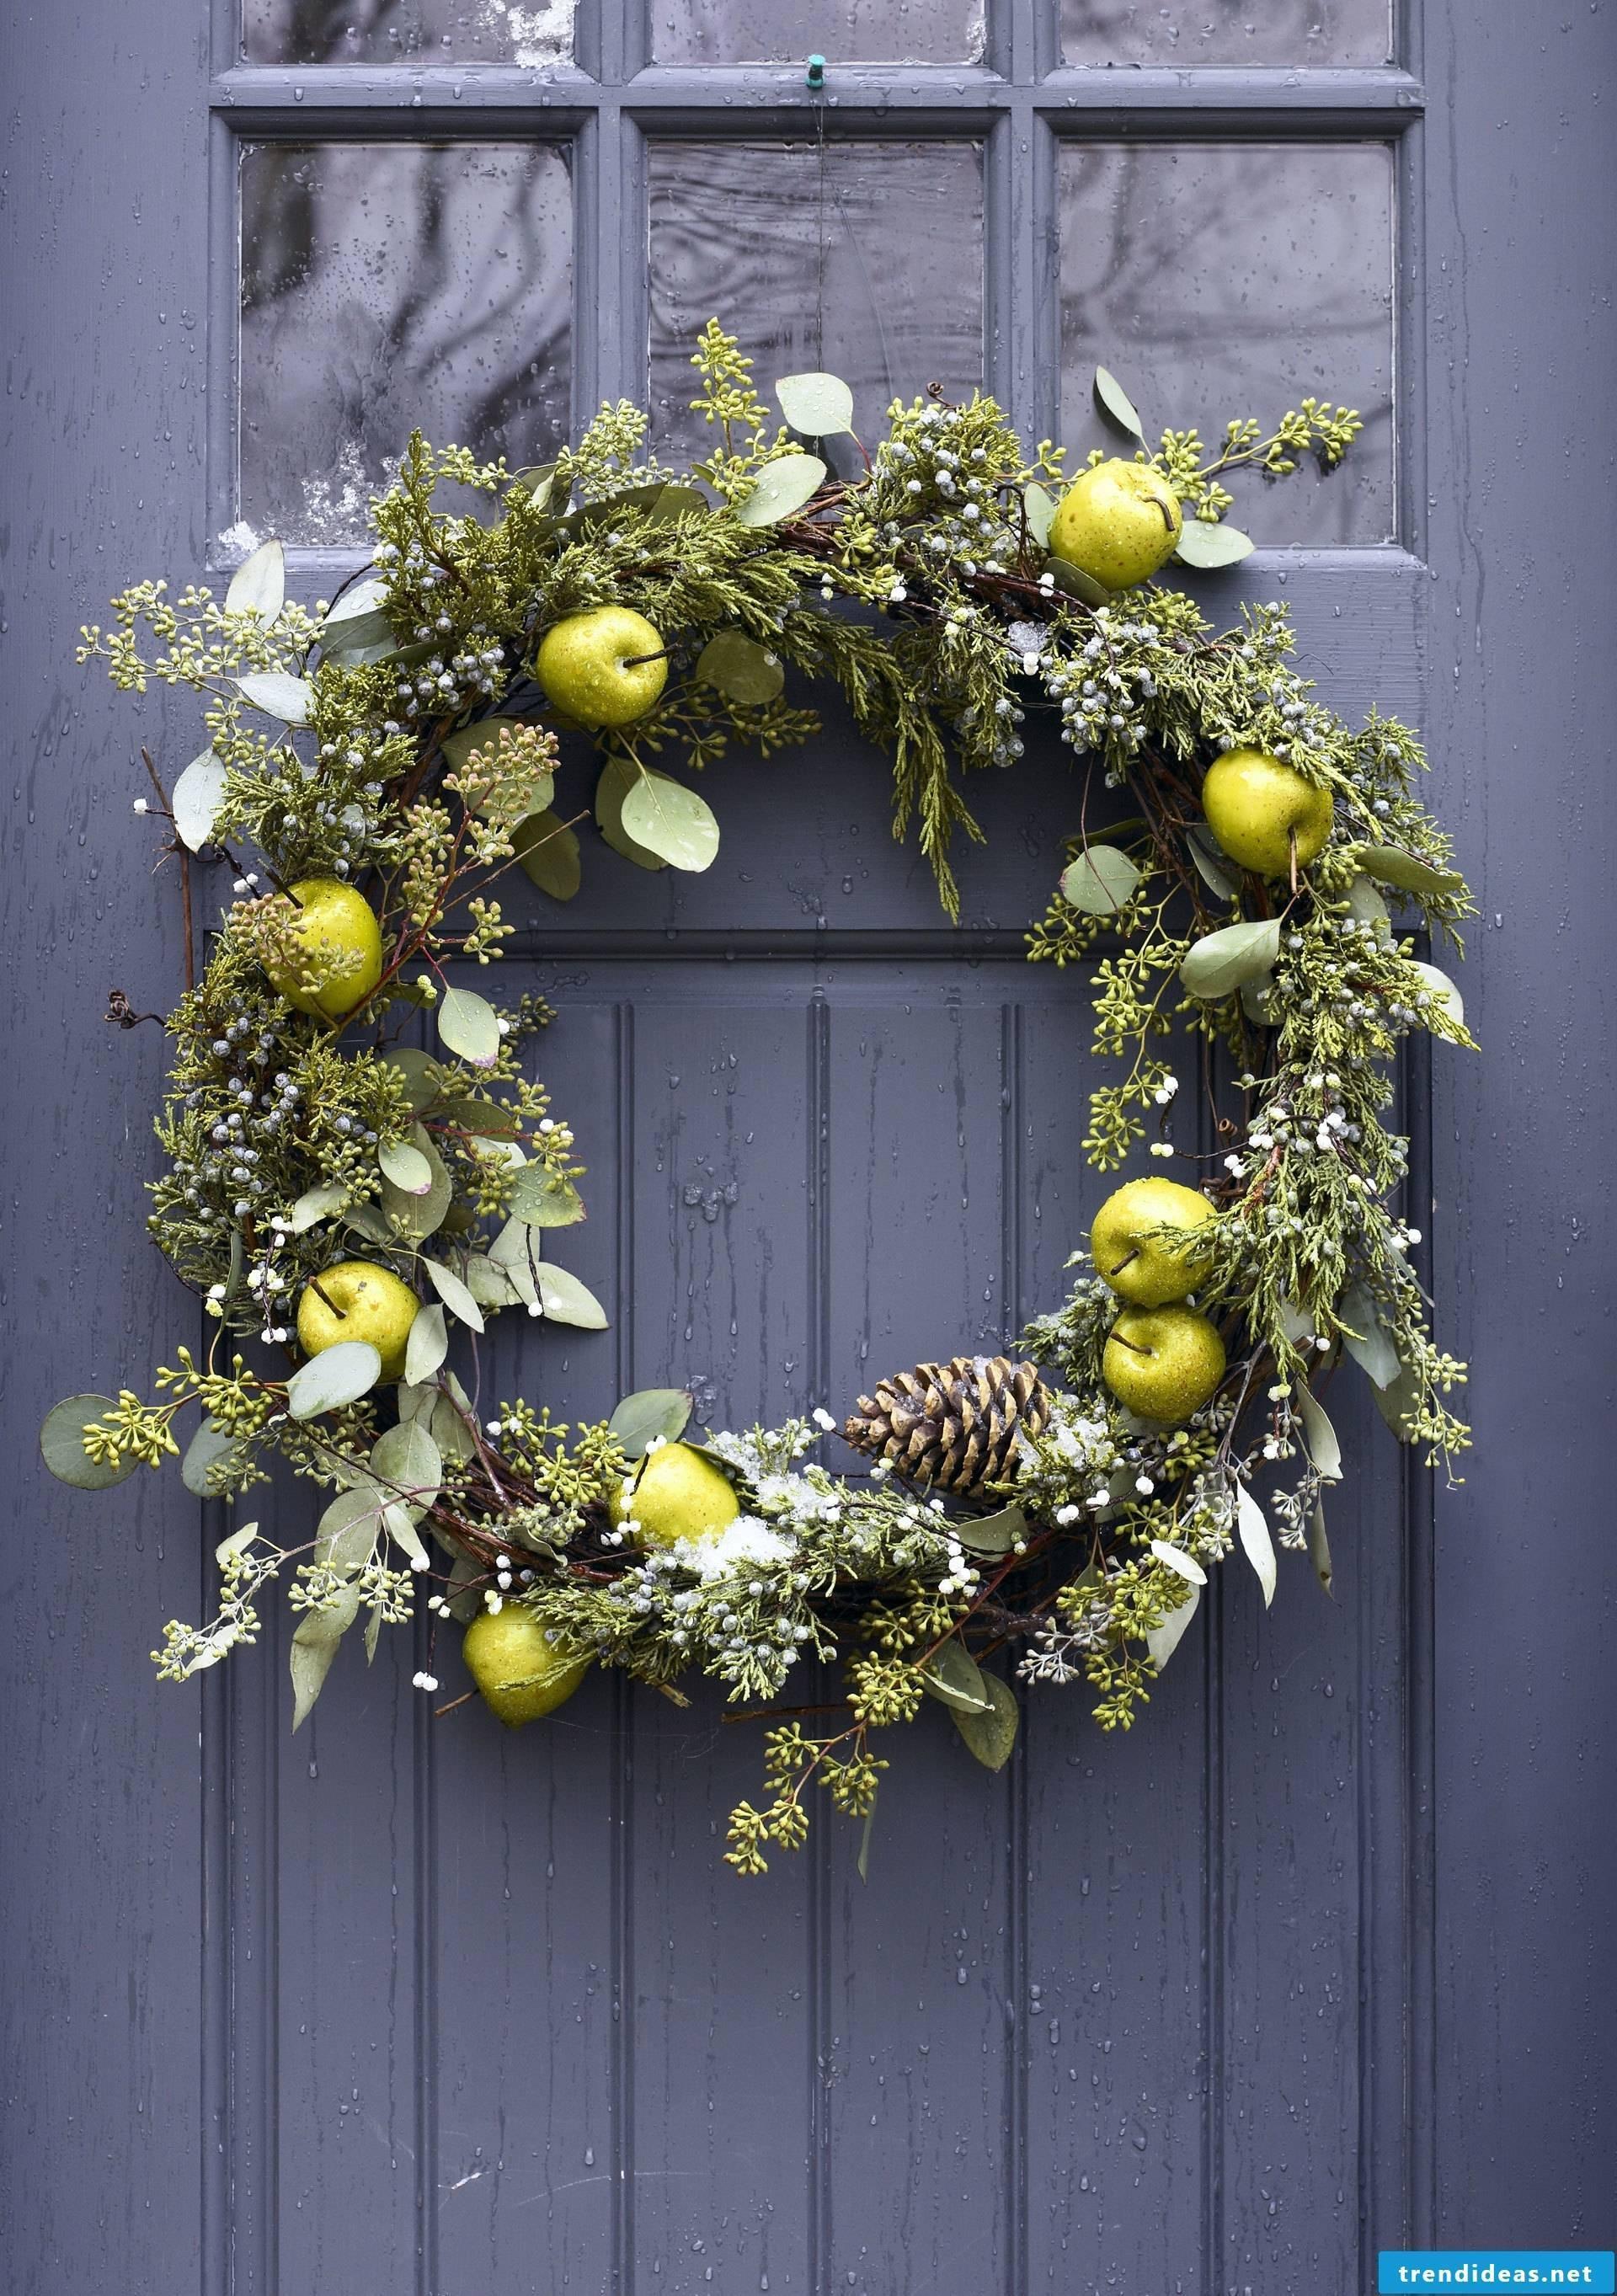 Christmas wreath with fresh apples